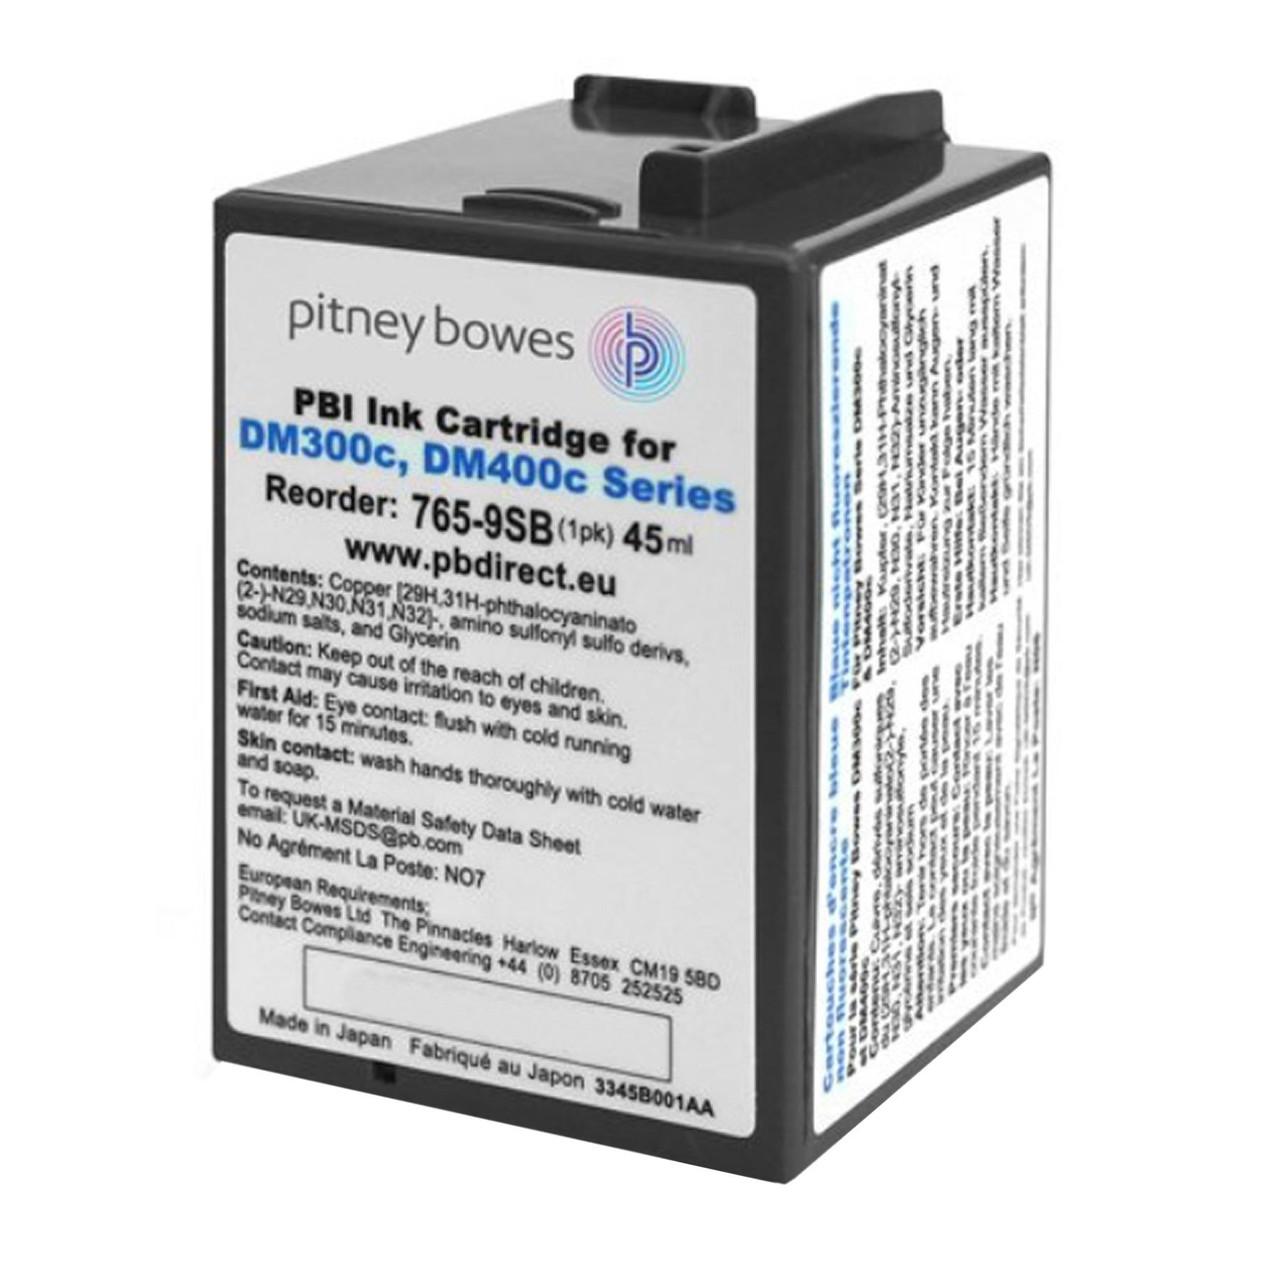 Original Pitney Bowes DM300c Ink Cartridge